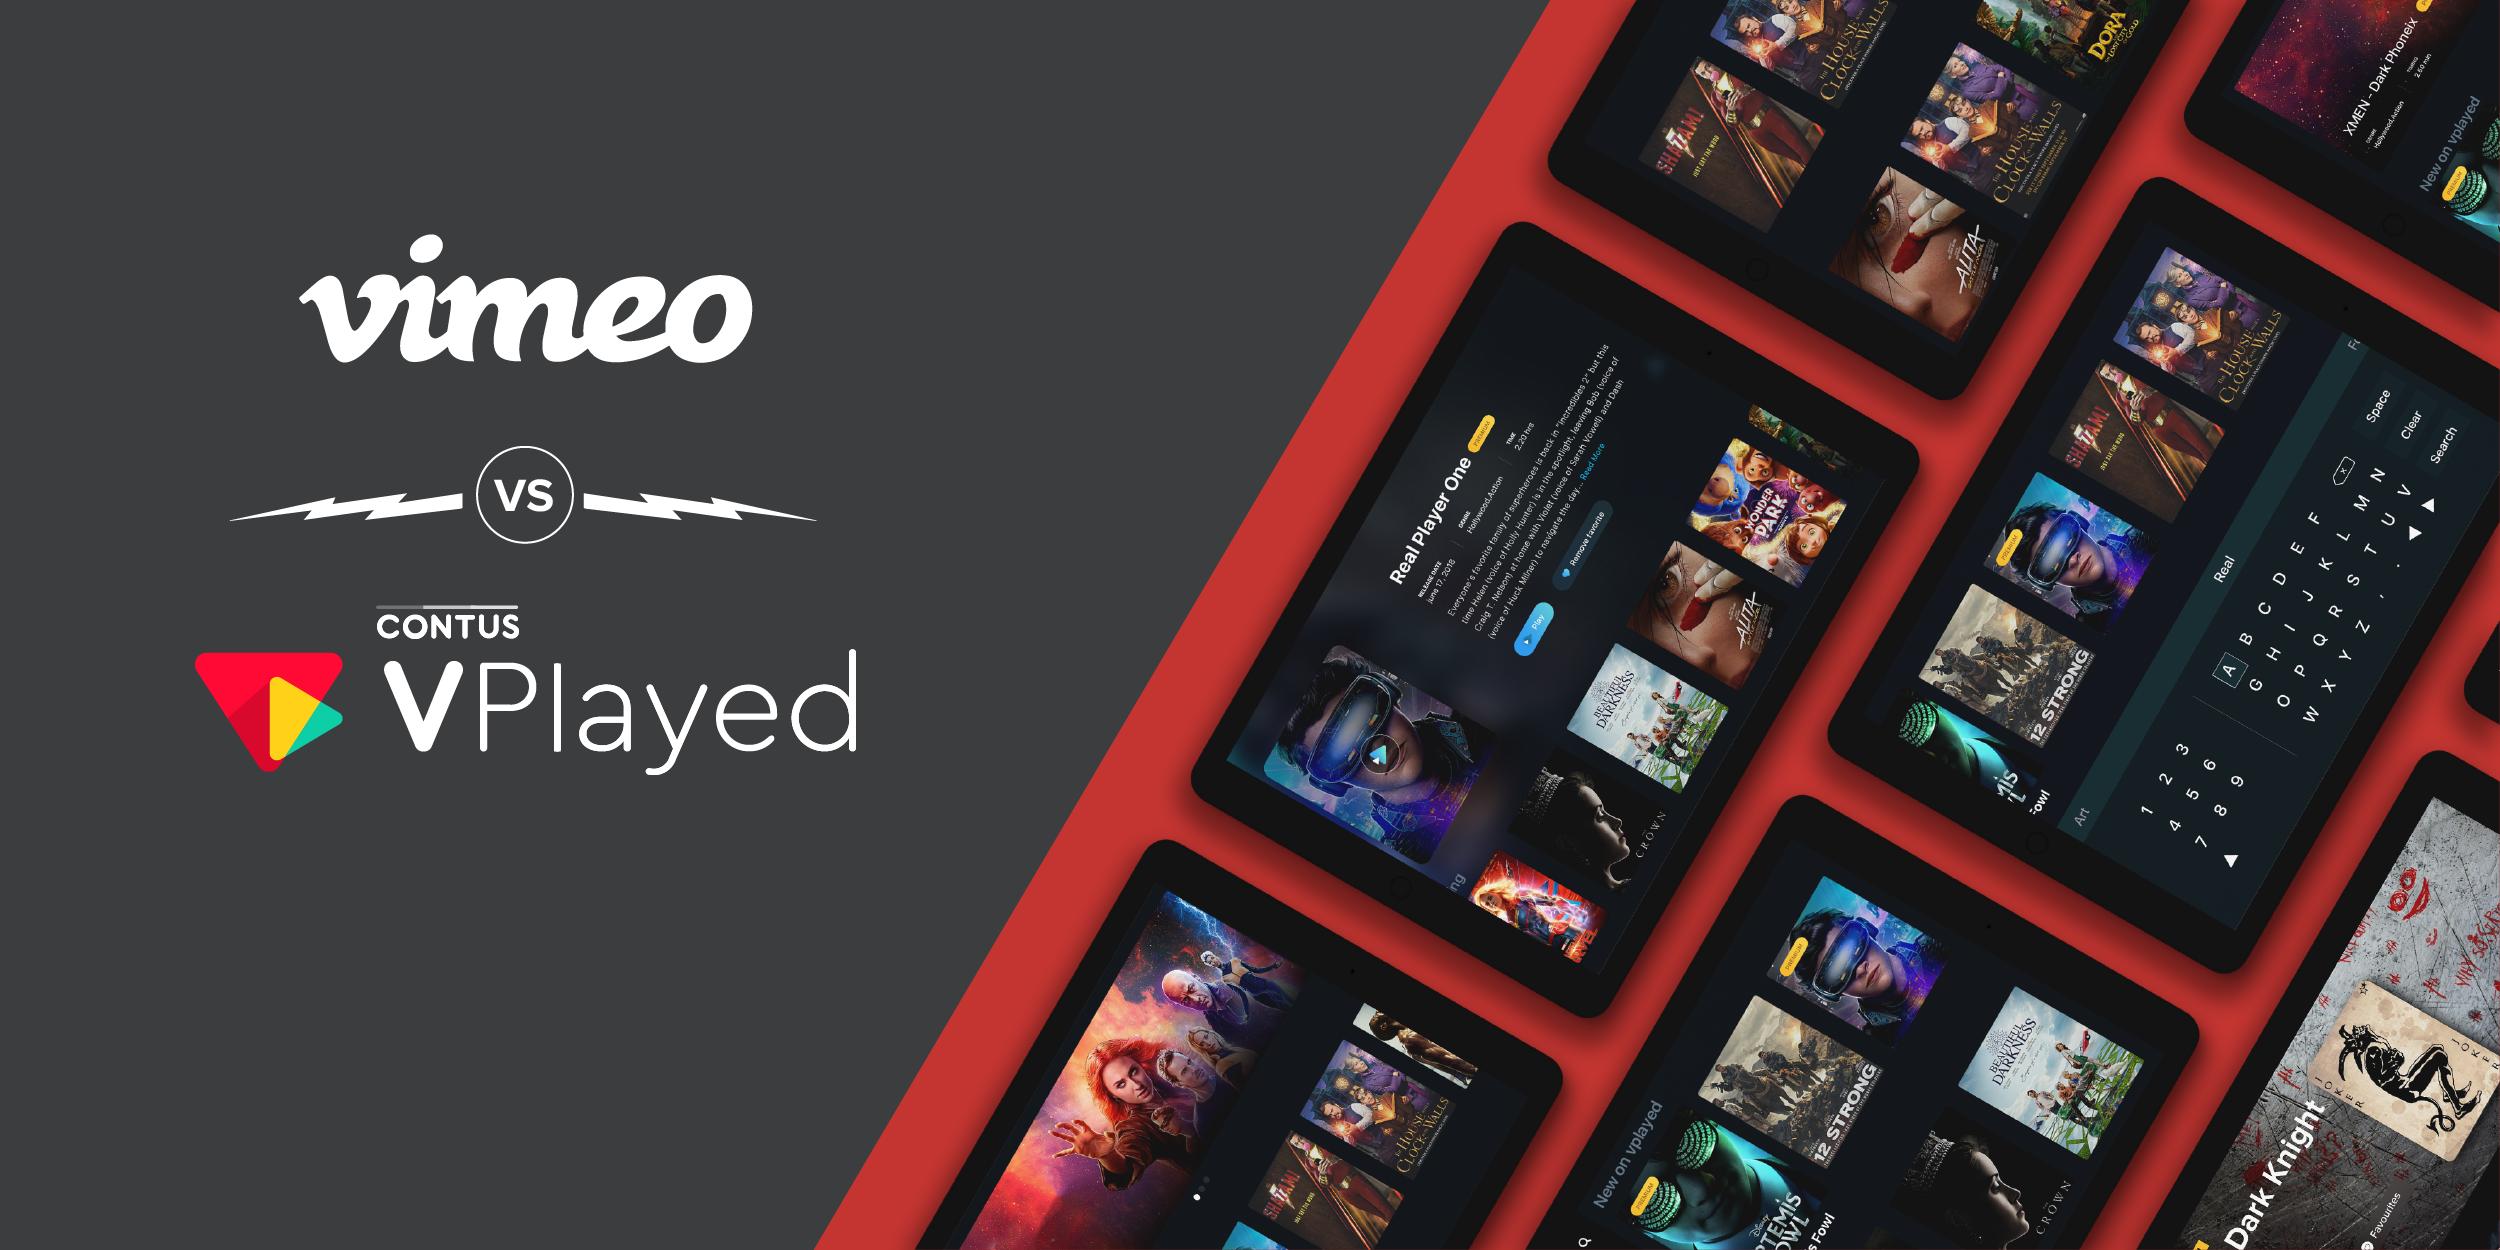 WordPress News: Review of Vimeo OTT: The Best Alternatives & Competitors in 2021